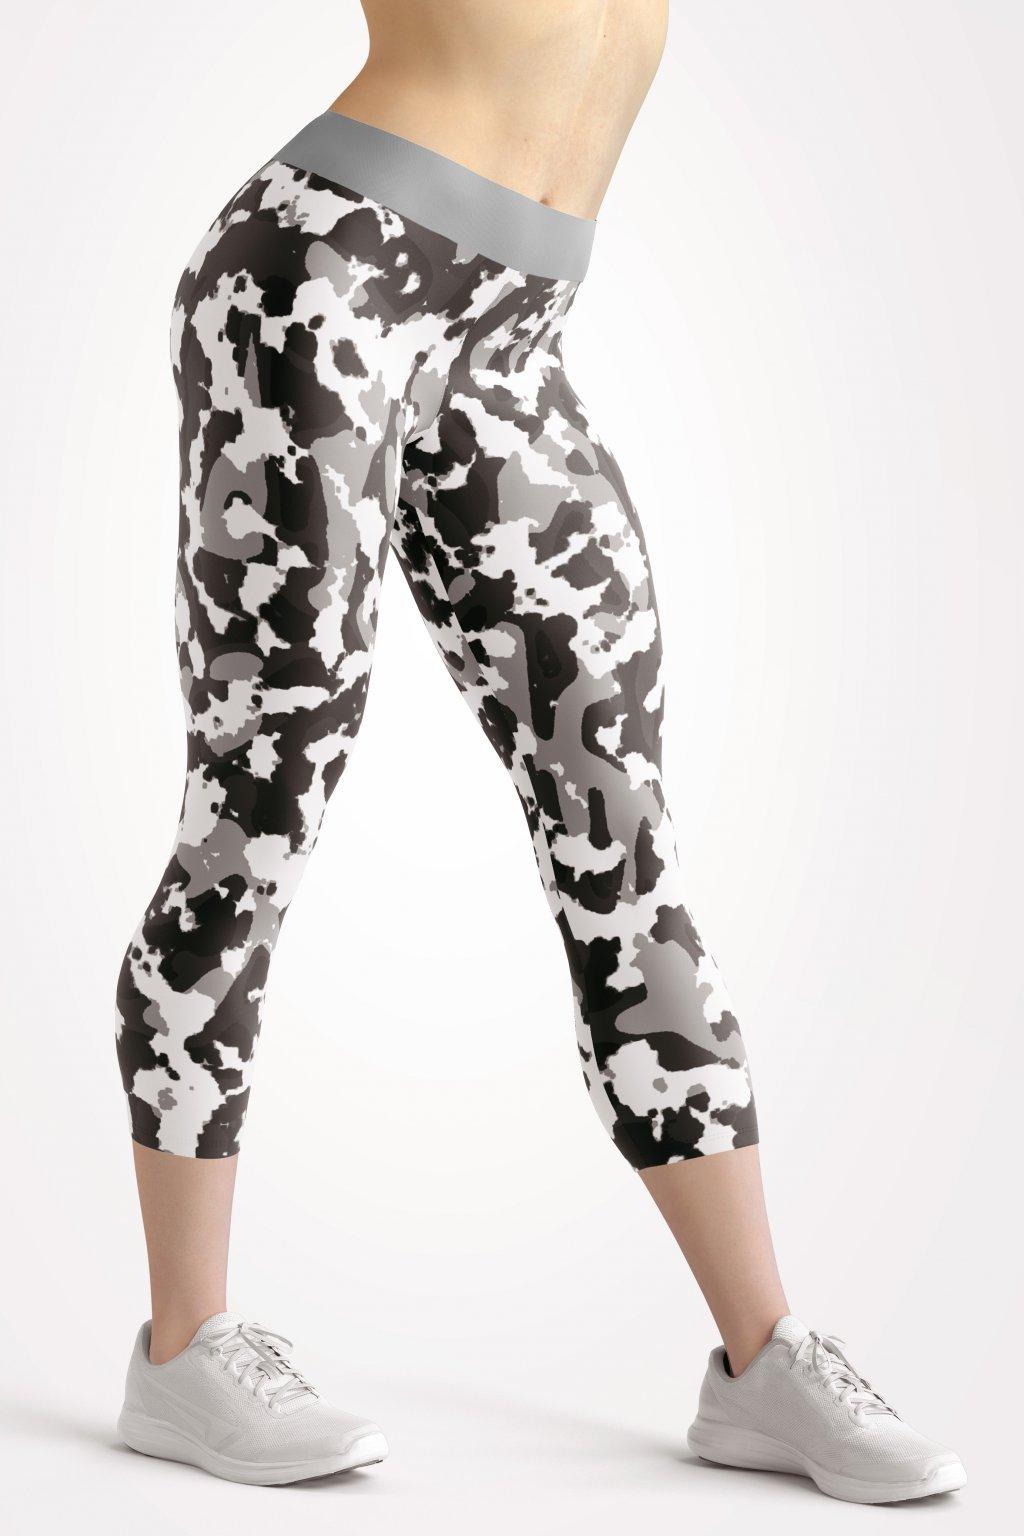 art of camo black front 3 4 leggings by utopy